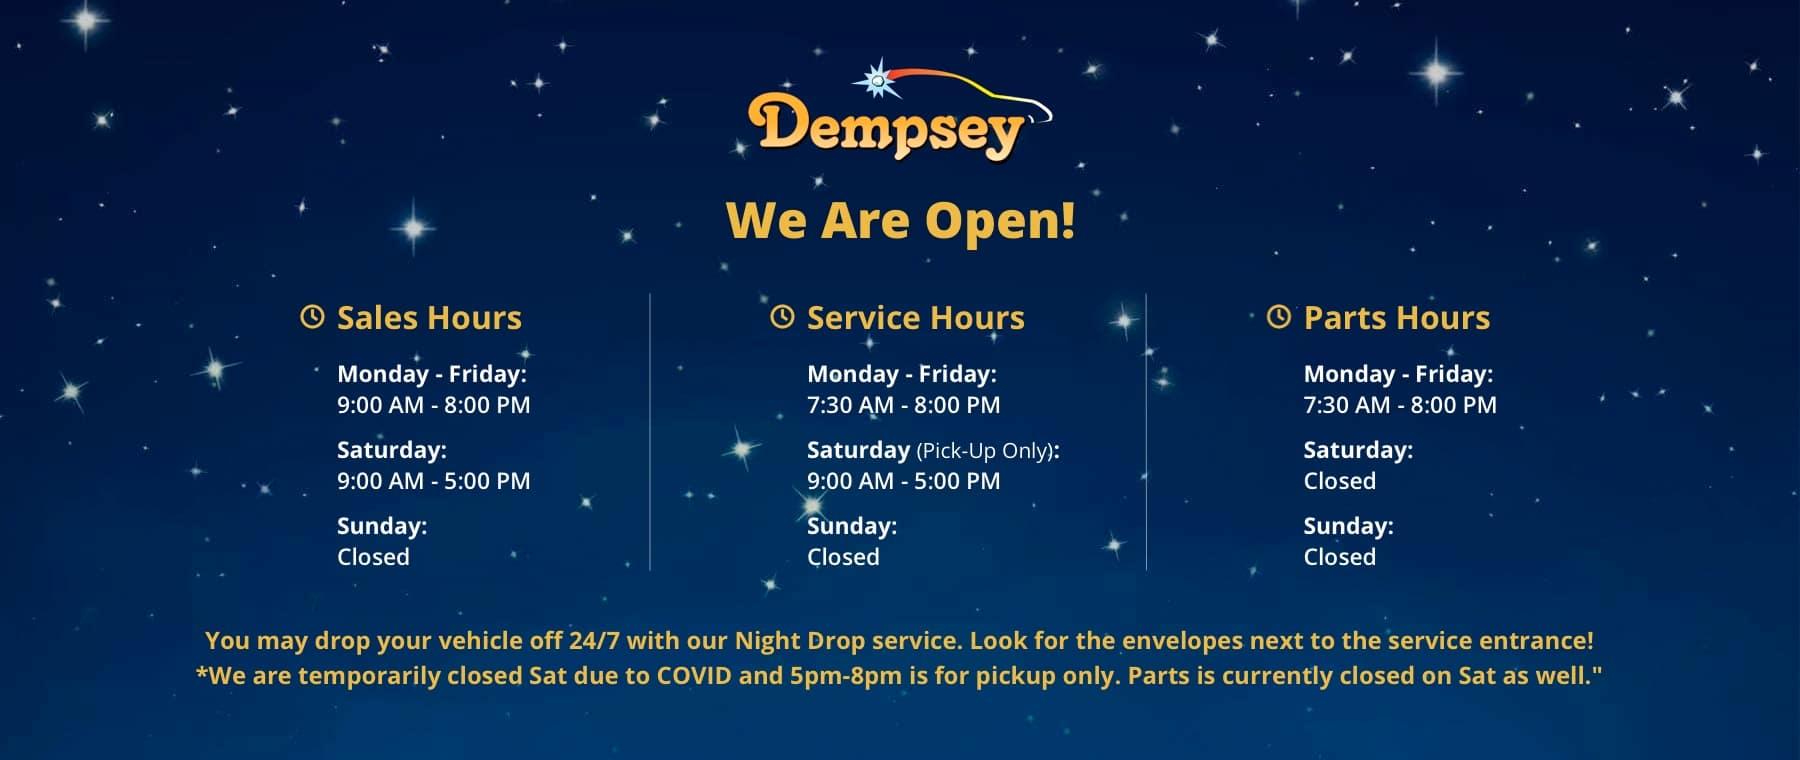 dempsey-open-hours-banner (1)